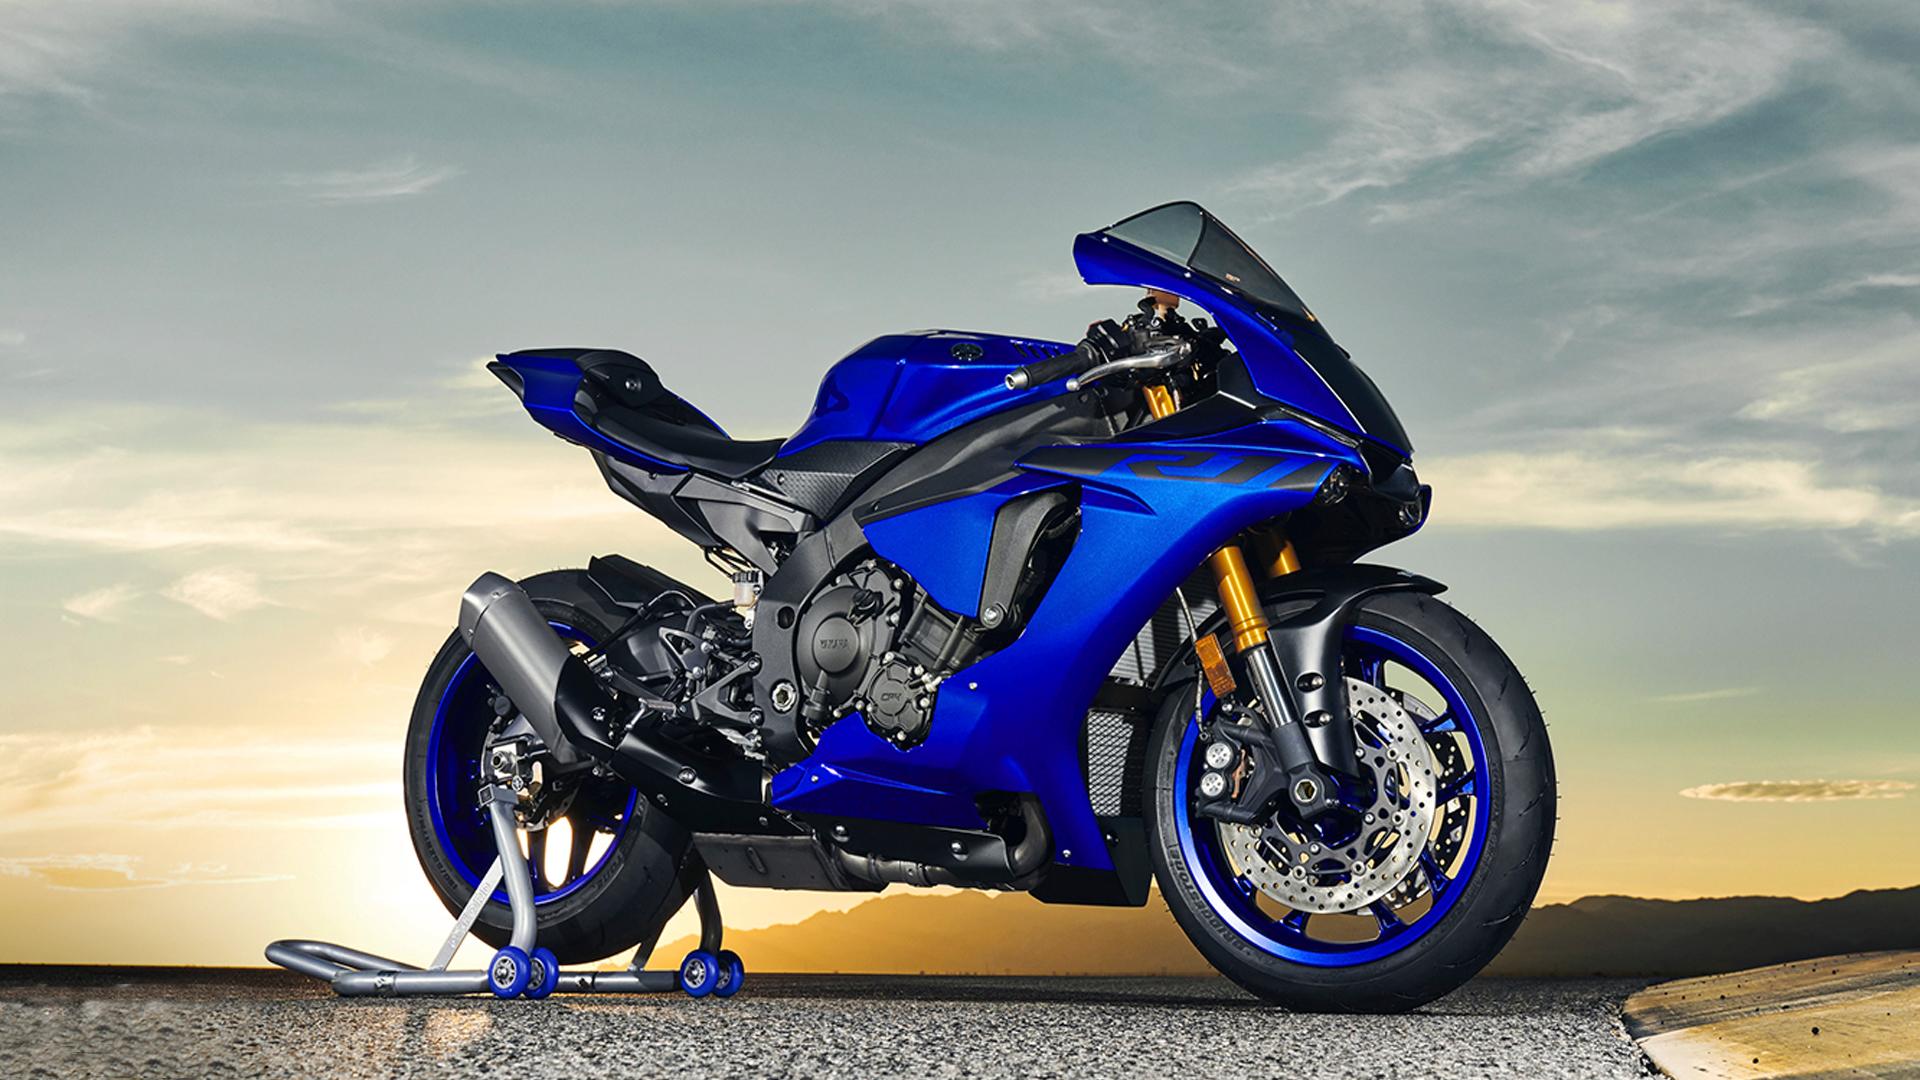 Yamaha YZF-R1 2018 - Price, Mileage, Reviews ...